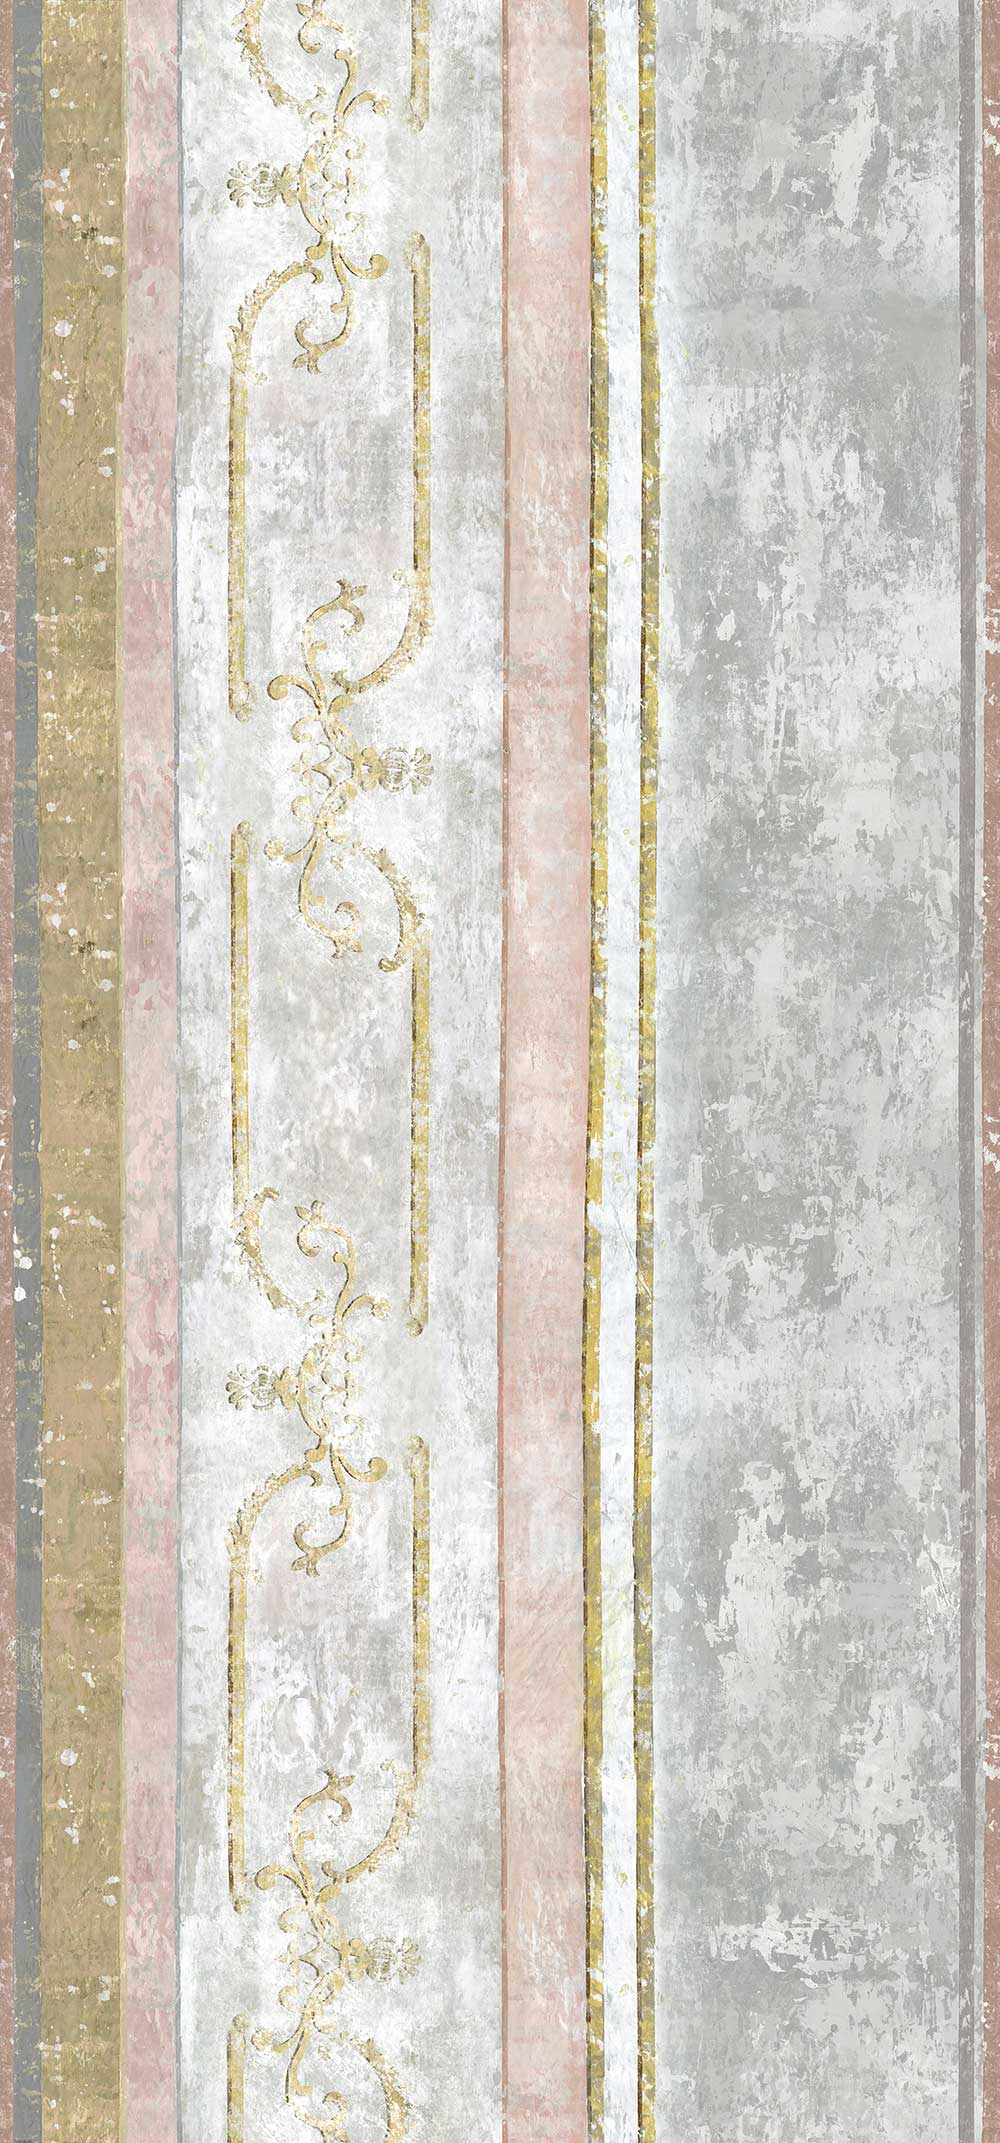 Foscari Fresco Scene 1 Mural - Tuberose - by Designers Guild